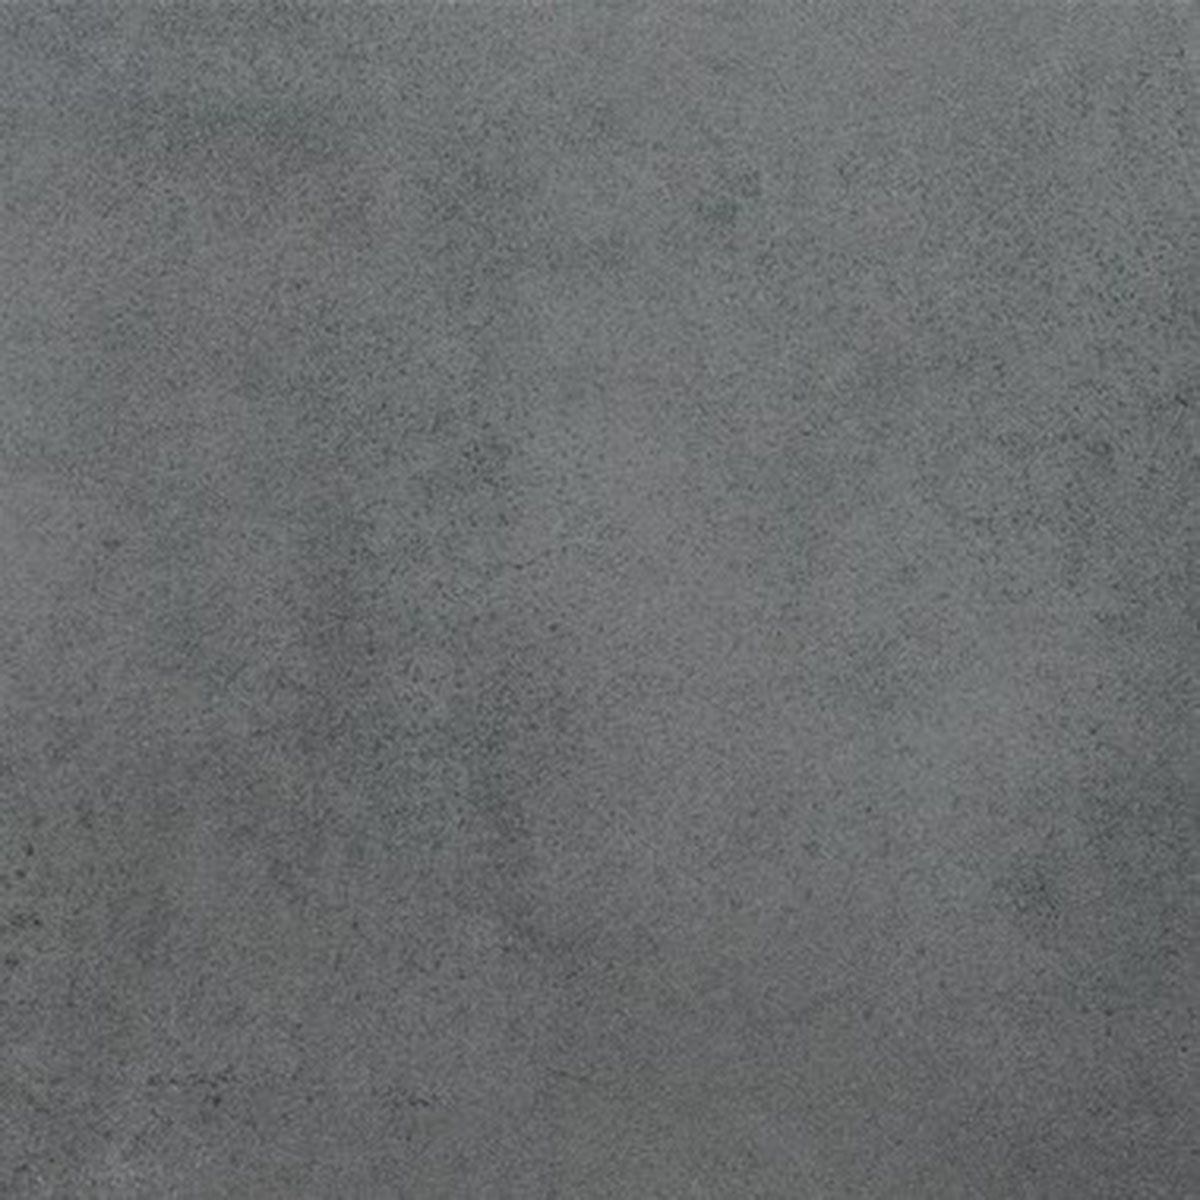 RAK Surface Mid Grey Lappato Tile 600 x 600mm